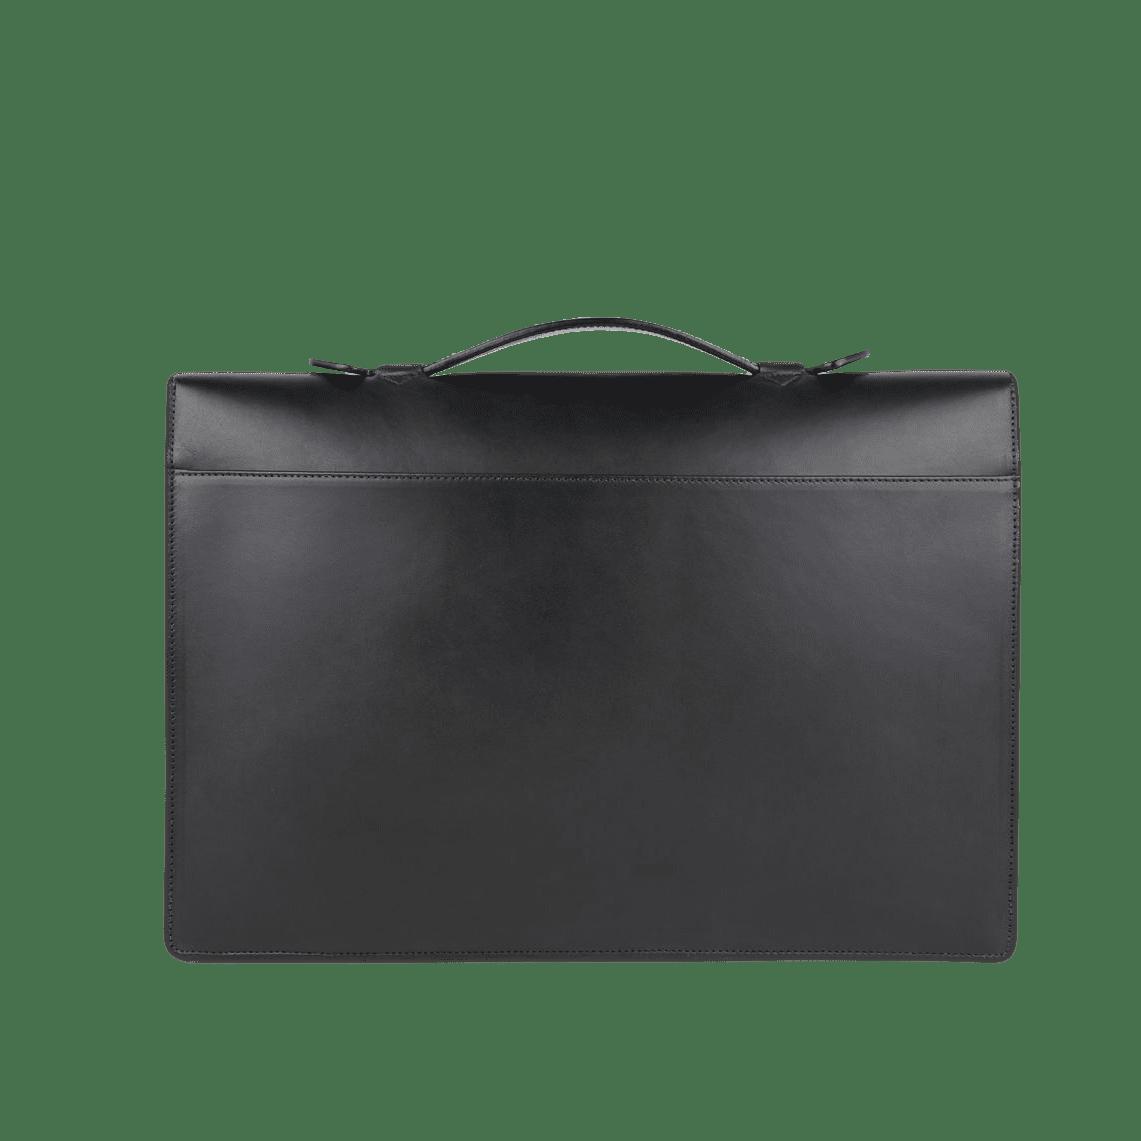 Frank Clegg Black The Port Brief Leather Briefcase Back